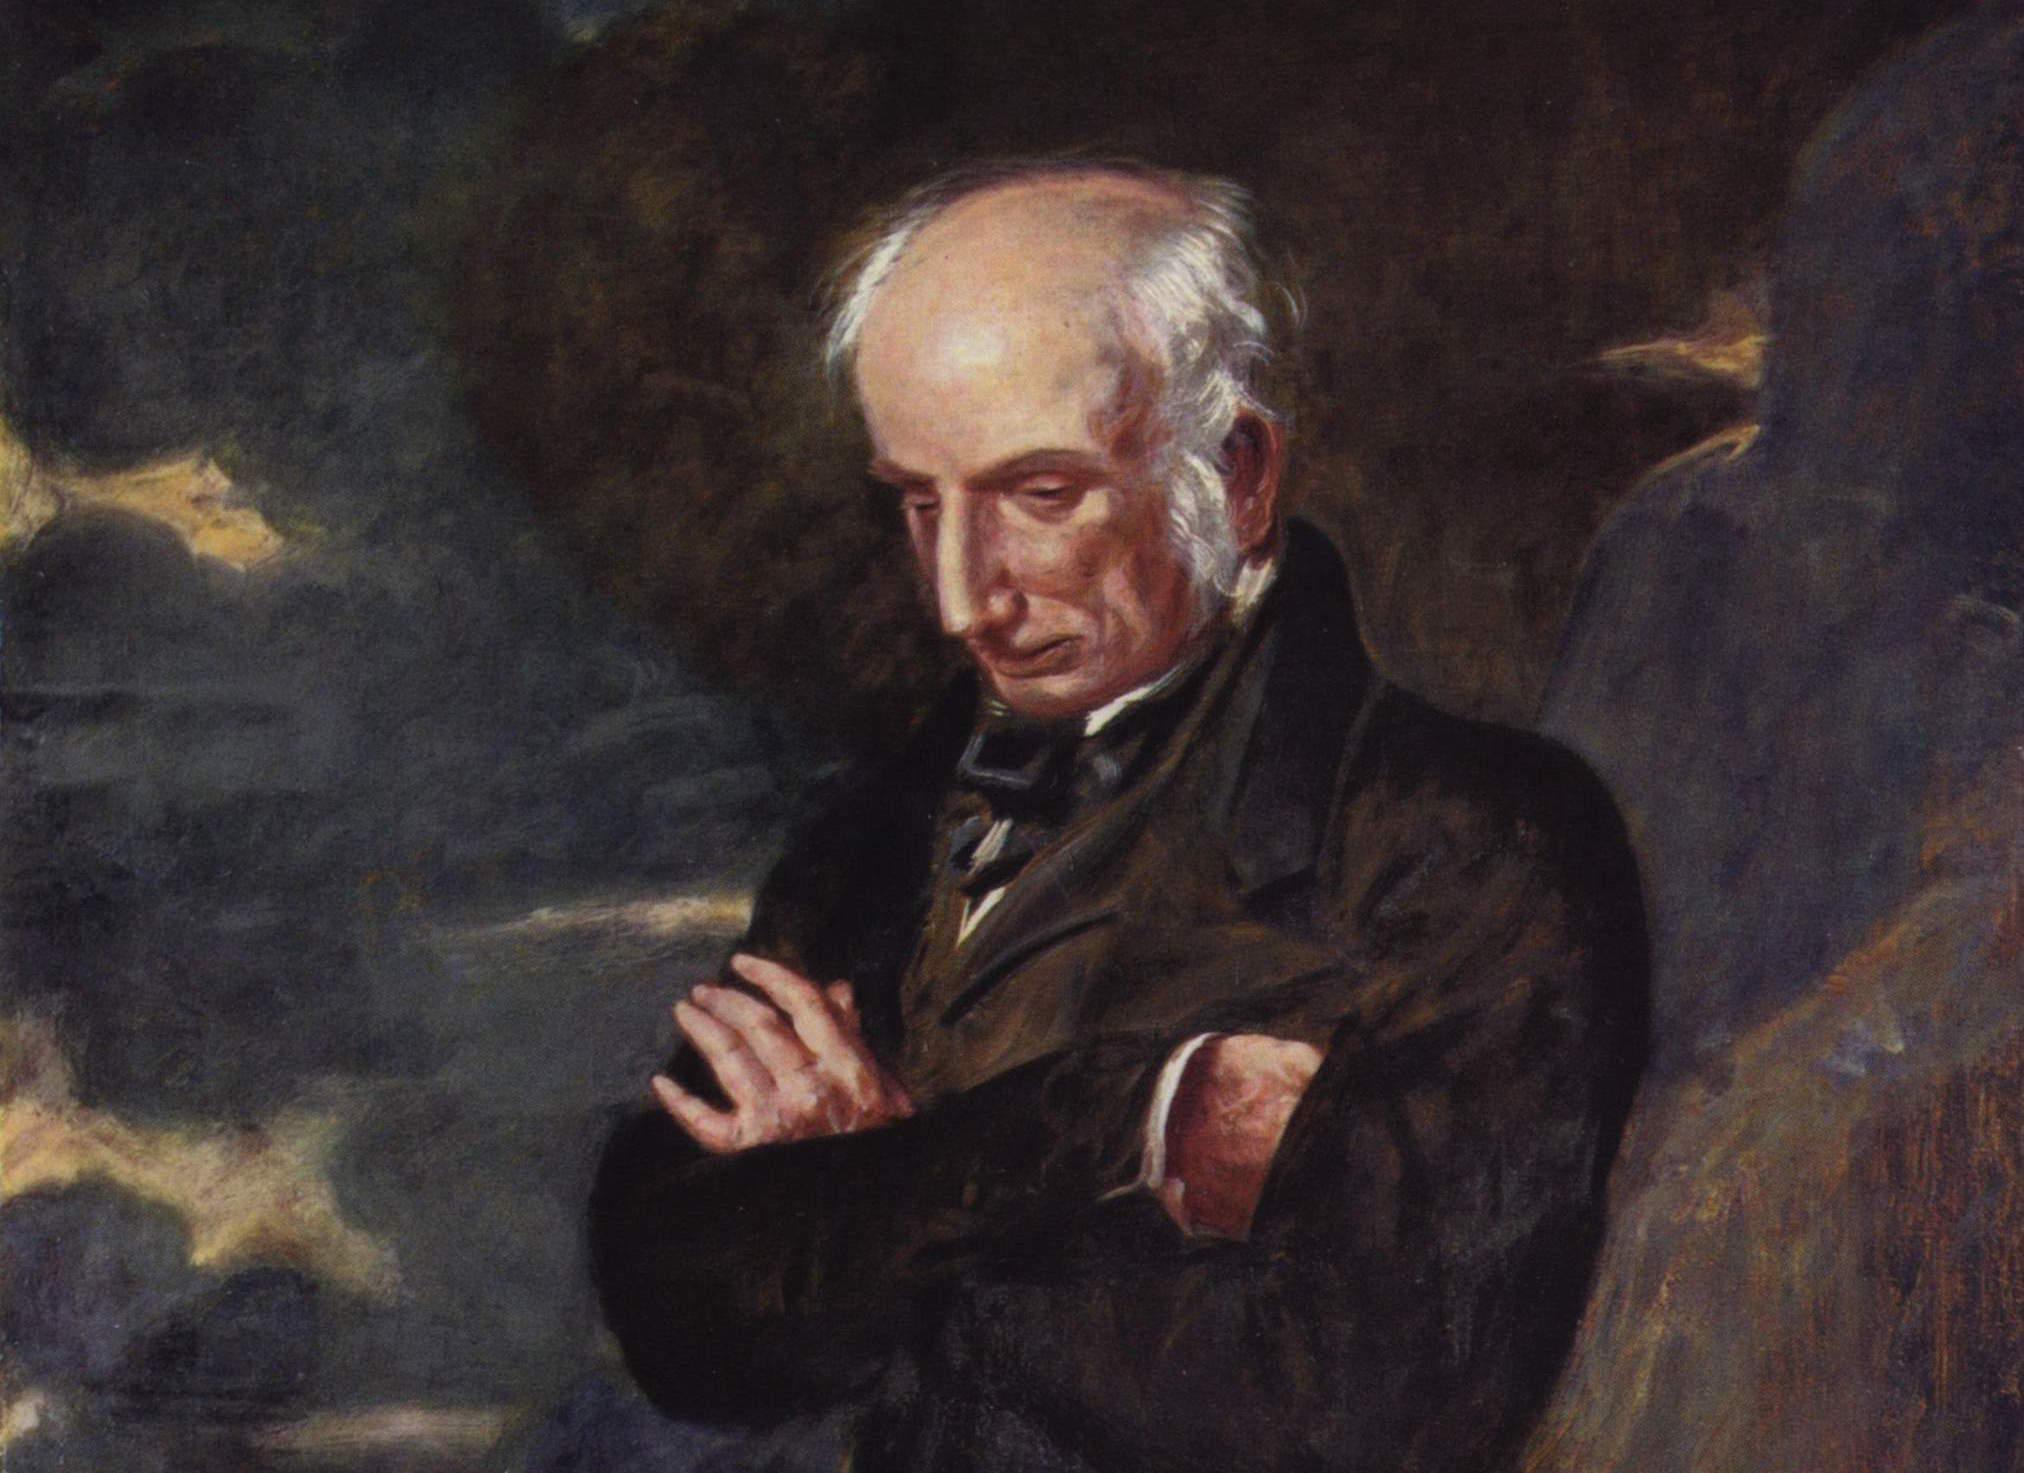 William Wordsworth Saves the Internet